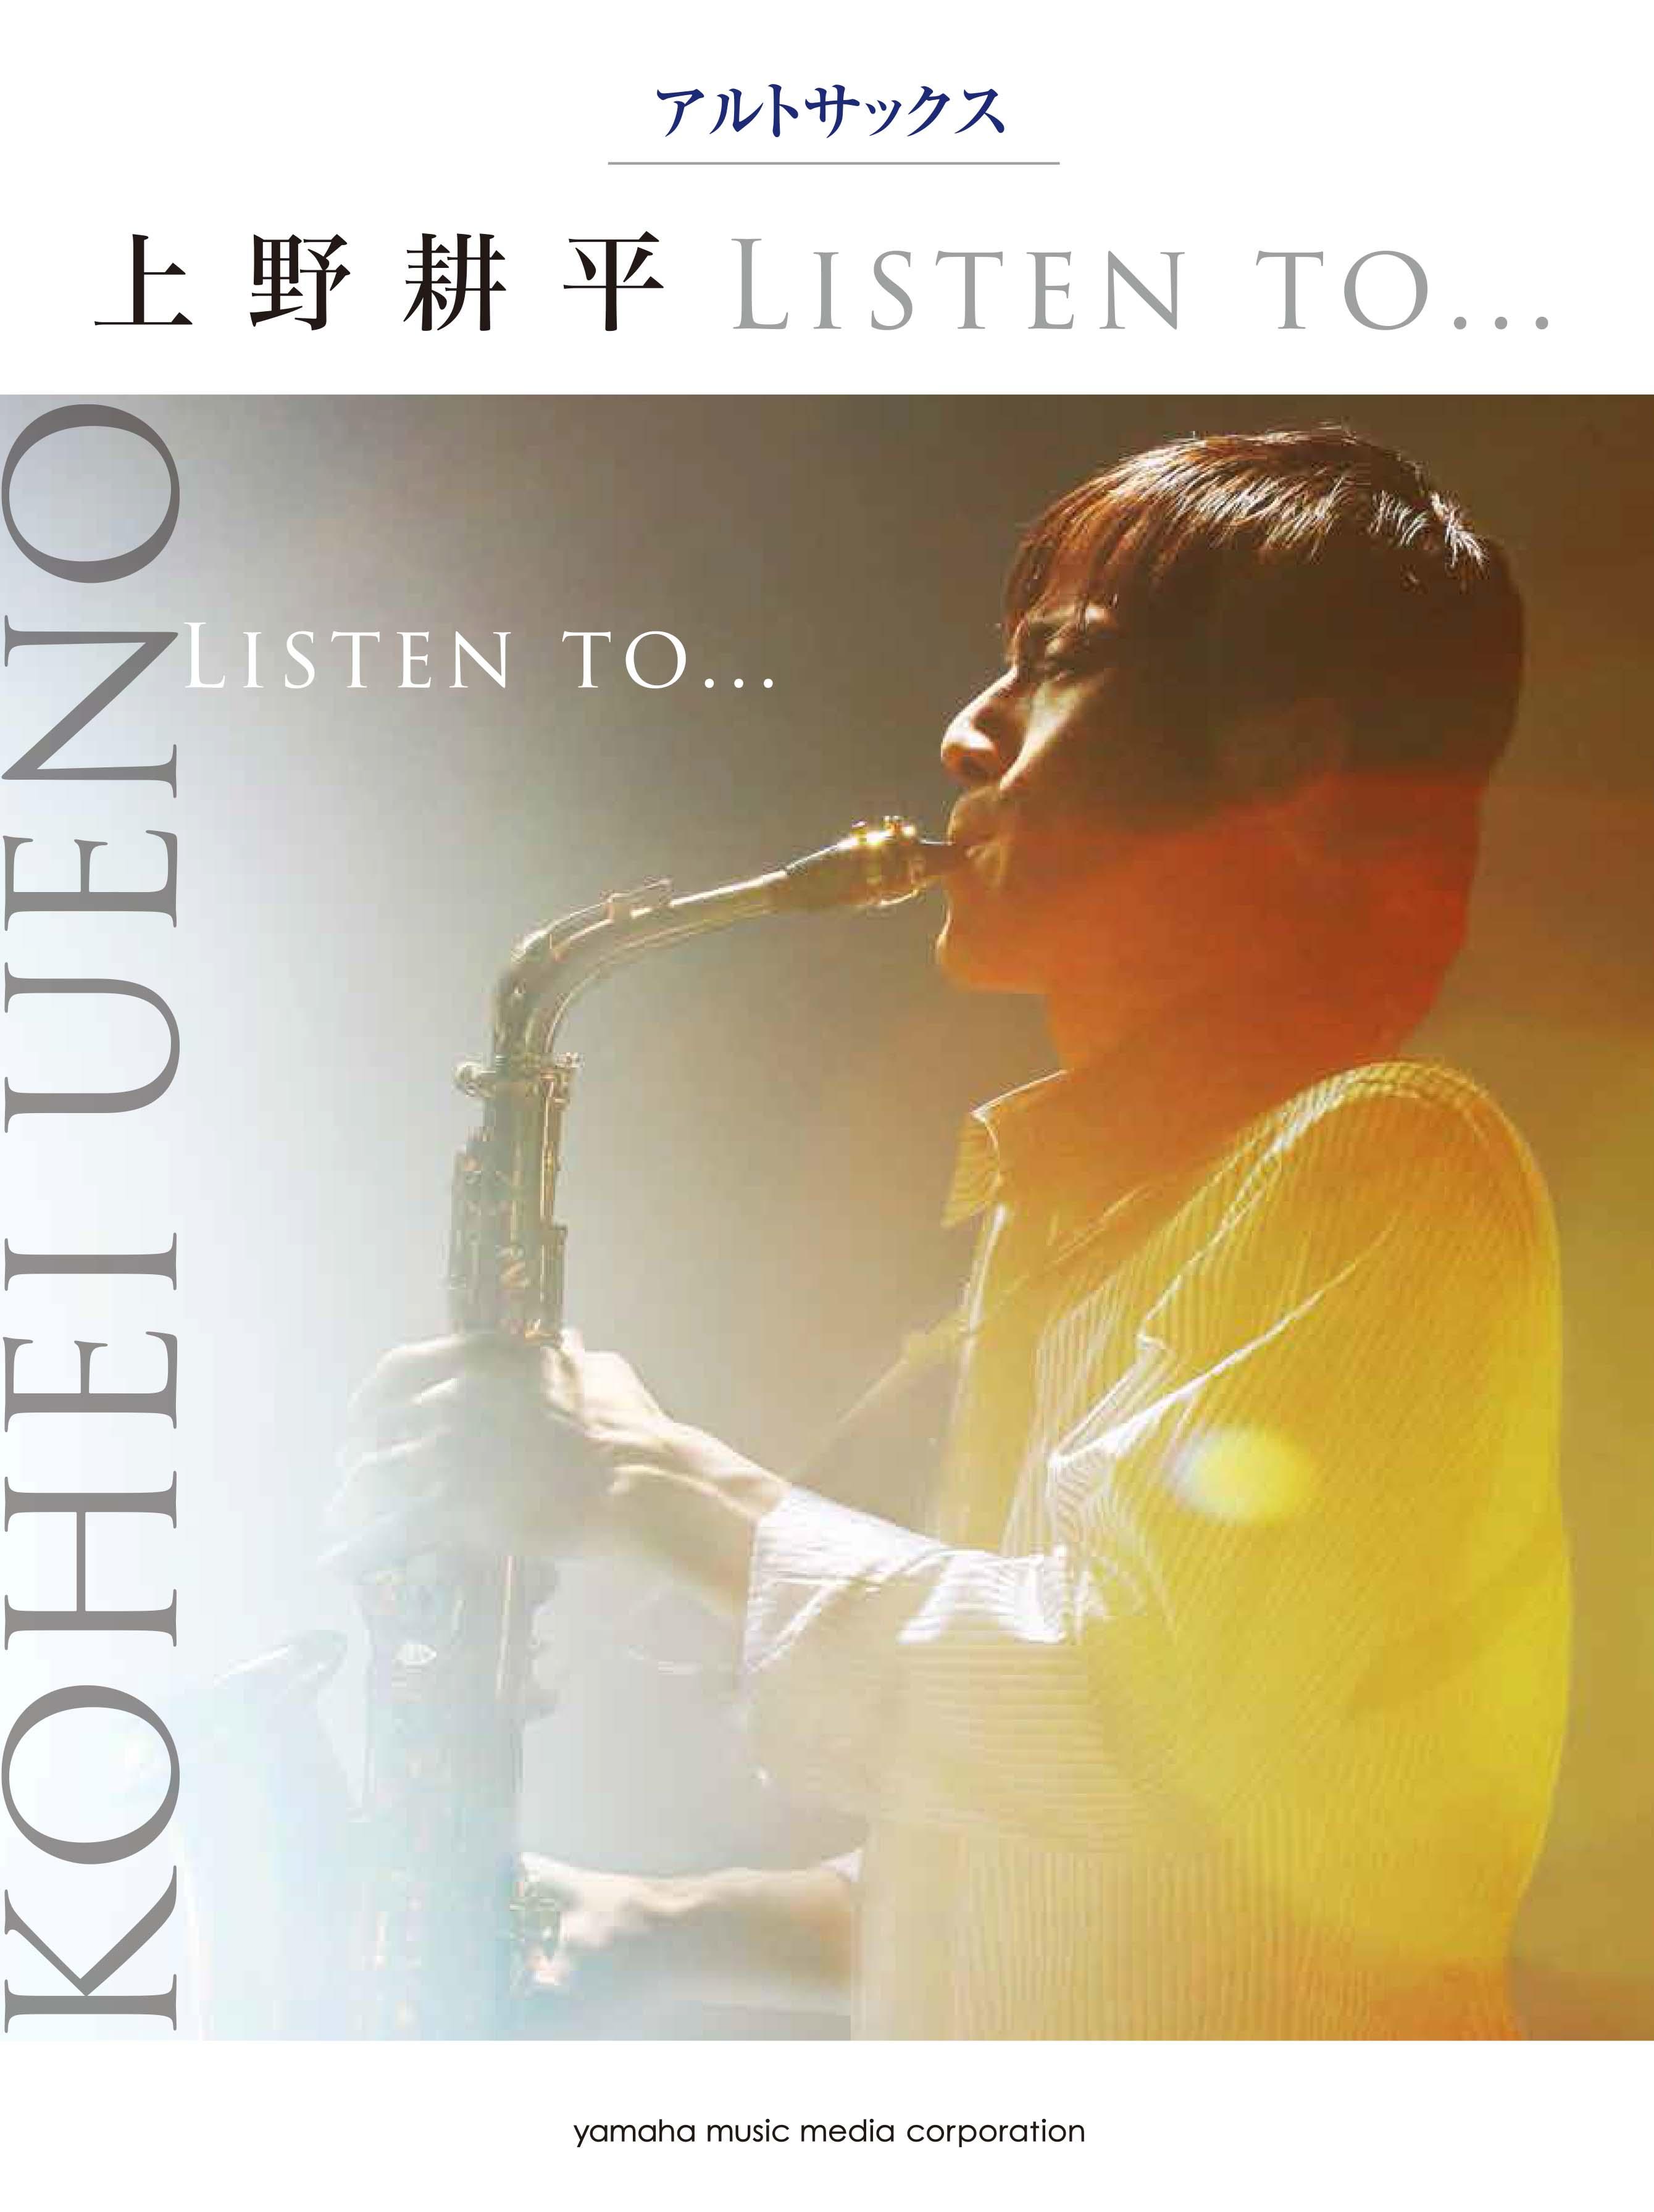 「Listen to…」マッチング楽譜